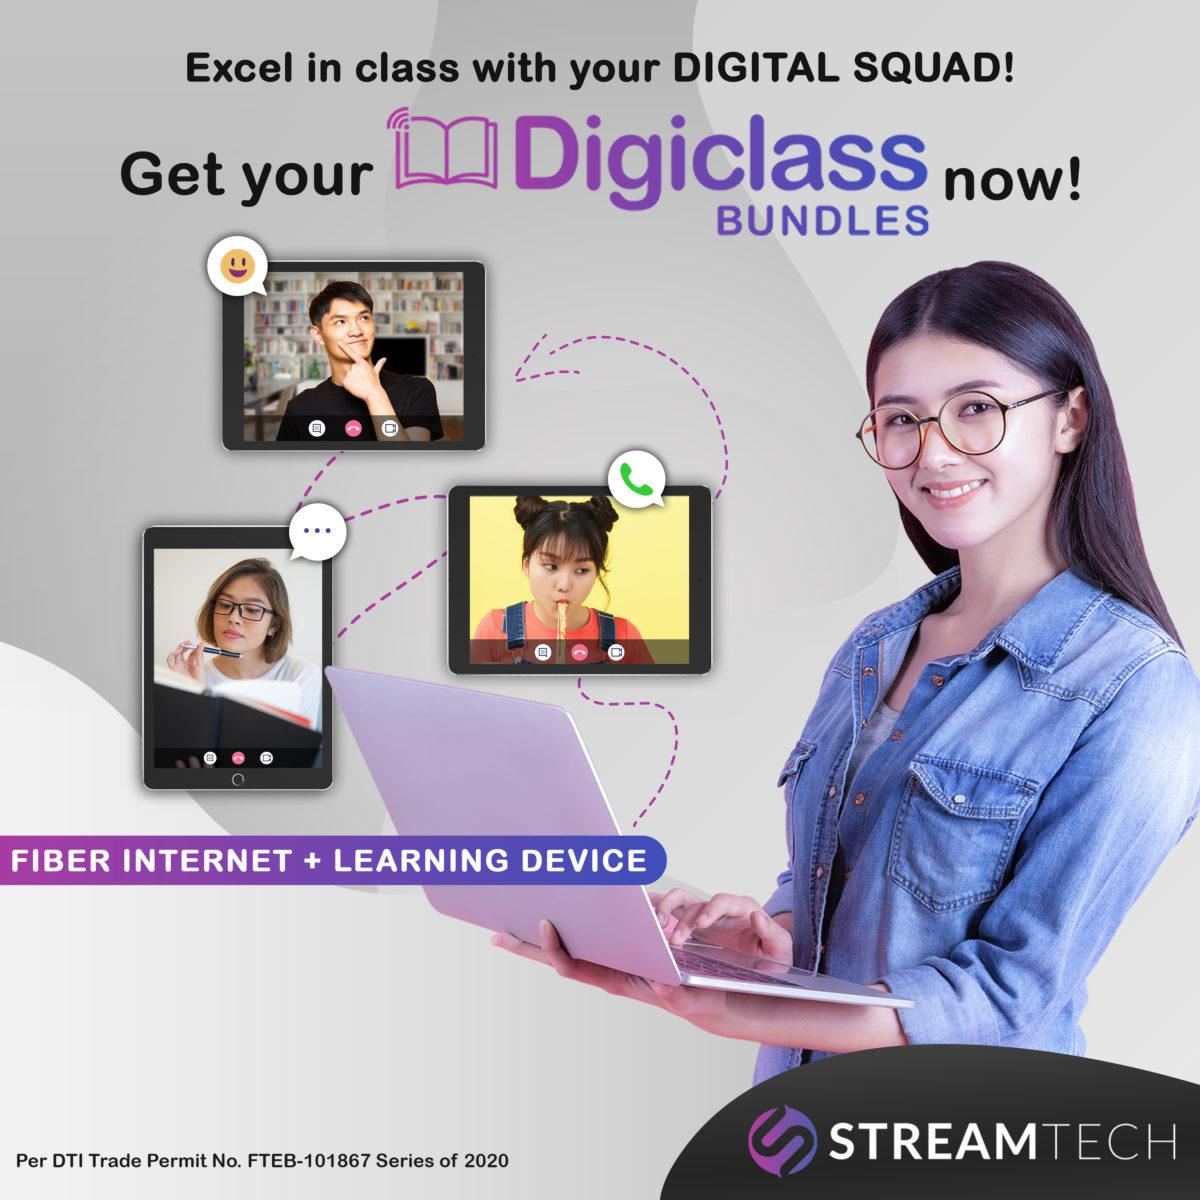 Excel in Your Online Class with Streamtech Fiber Internet's Digiclass Bundles